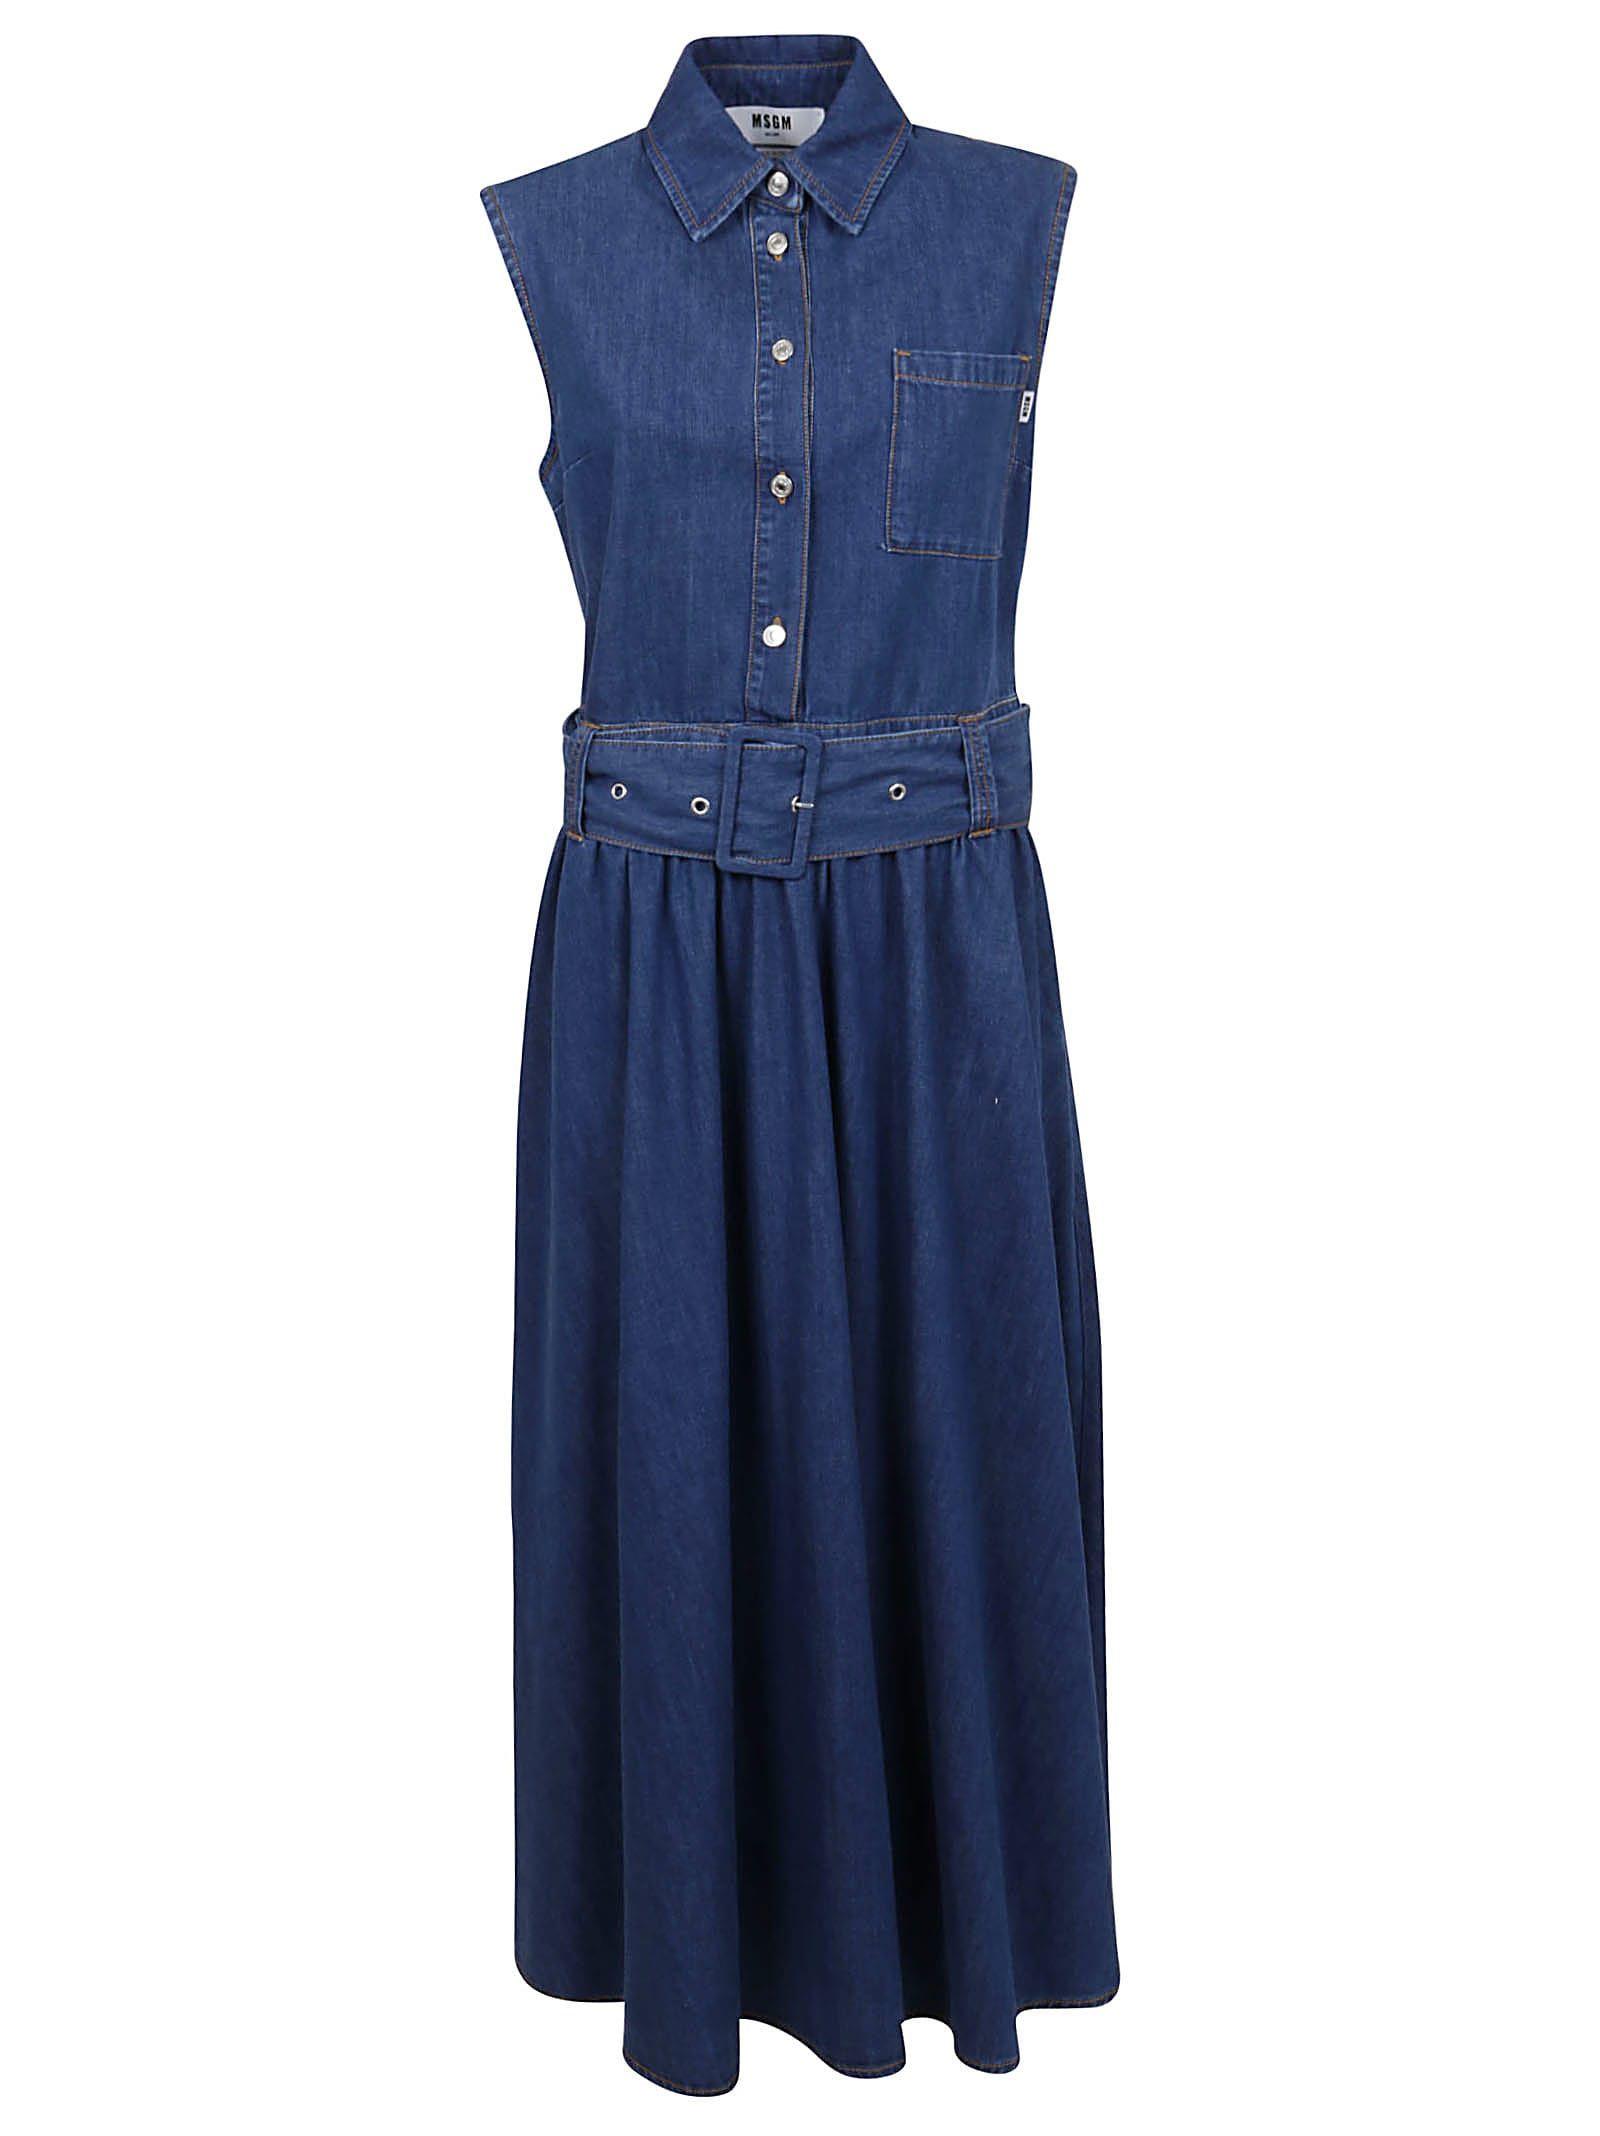 MSGM Abito In Denim/denim Dress from MSGMComposition: 100% Co